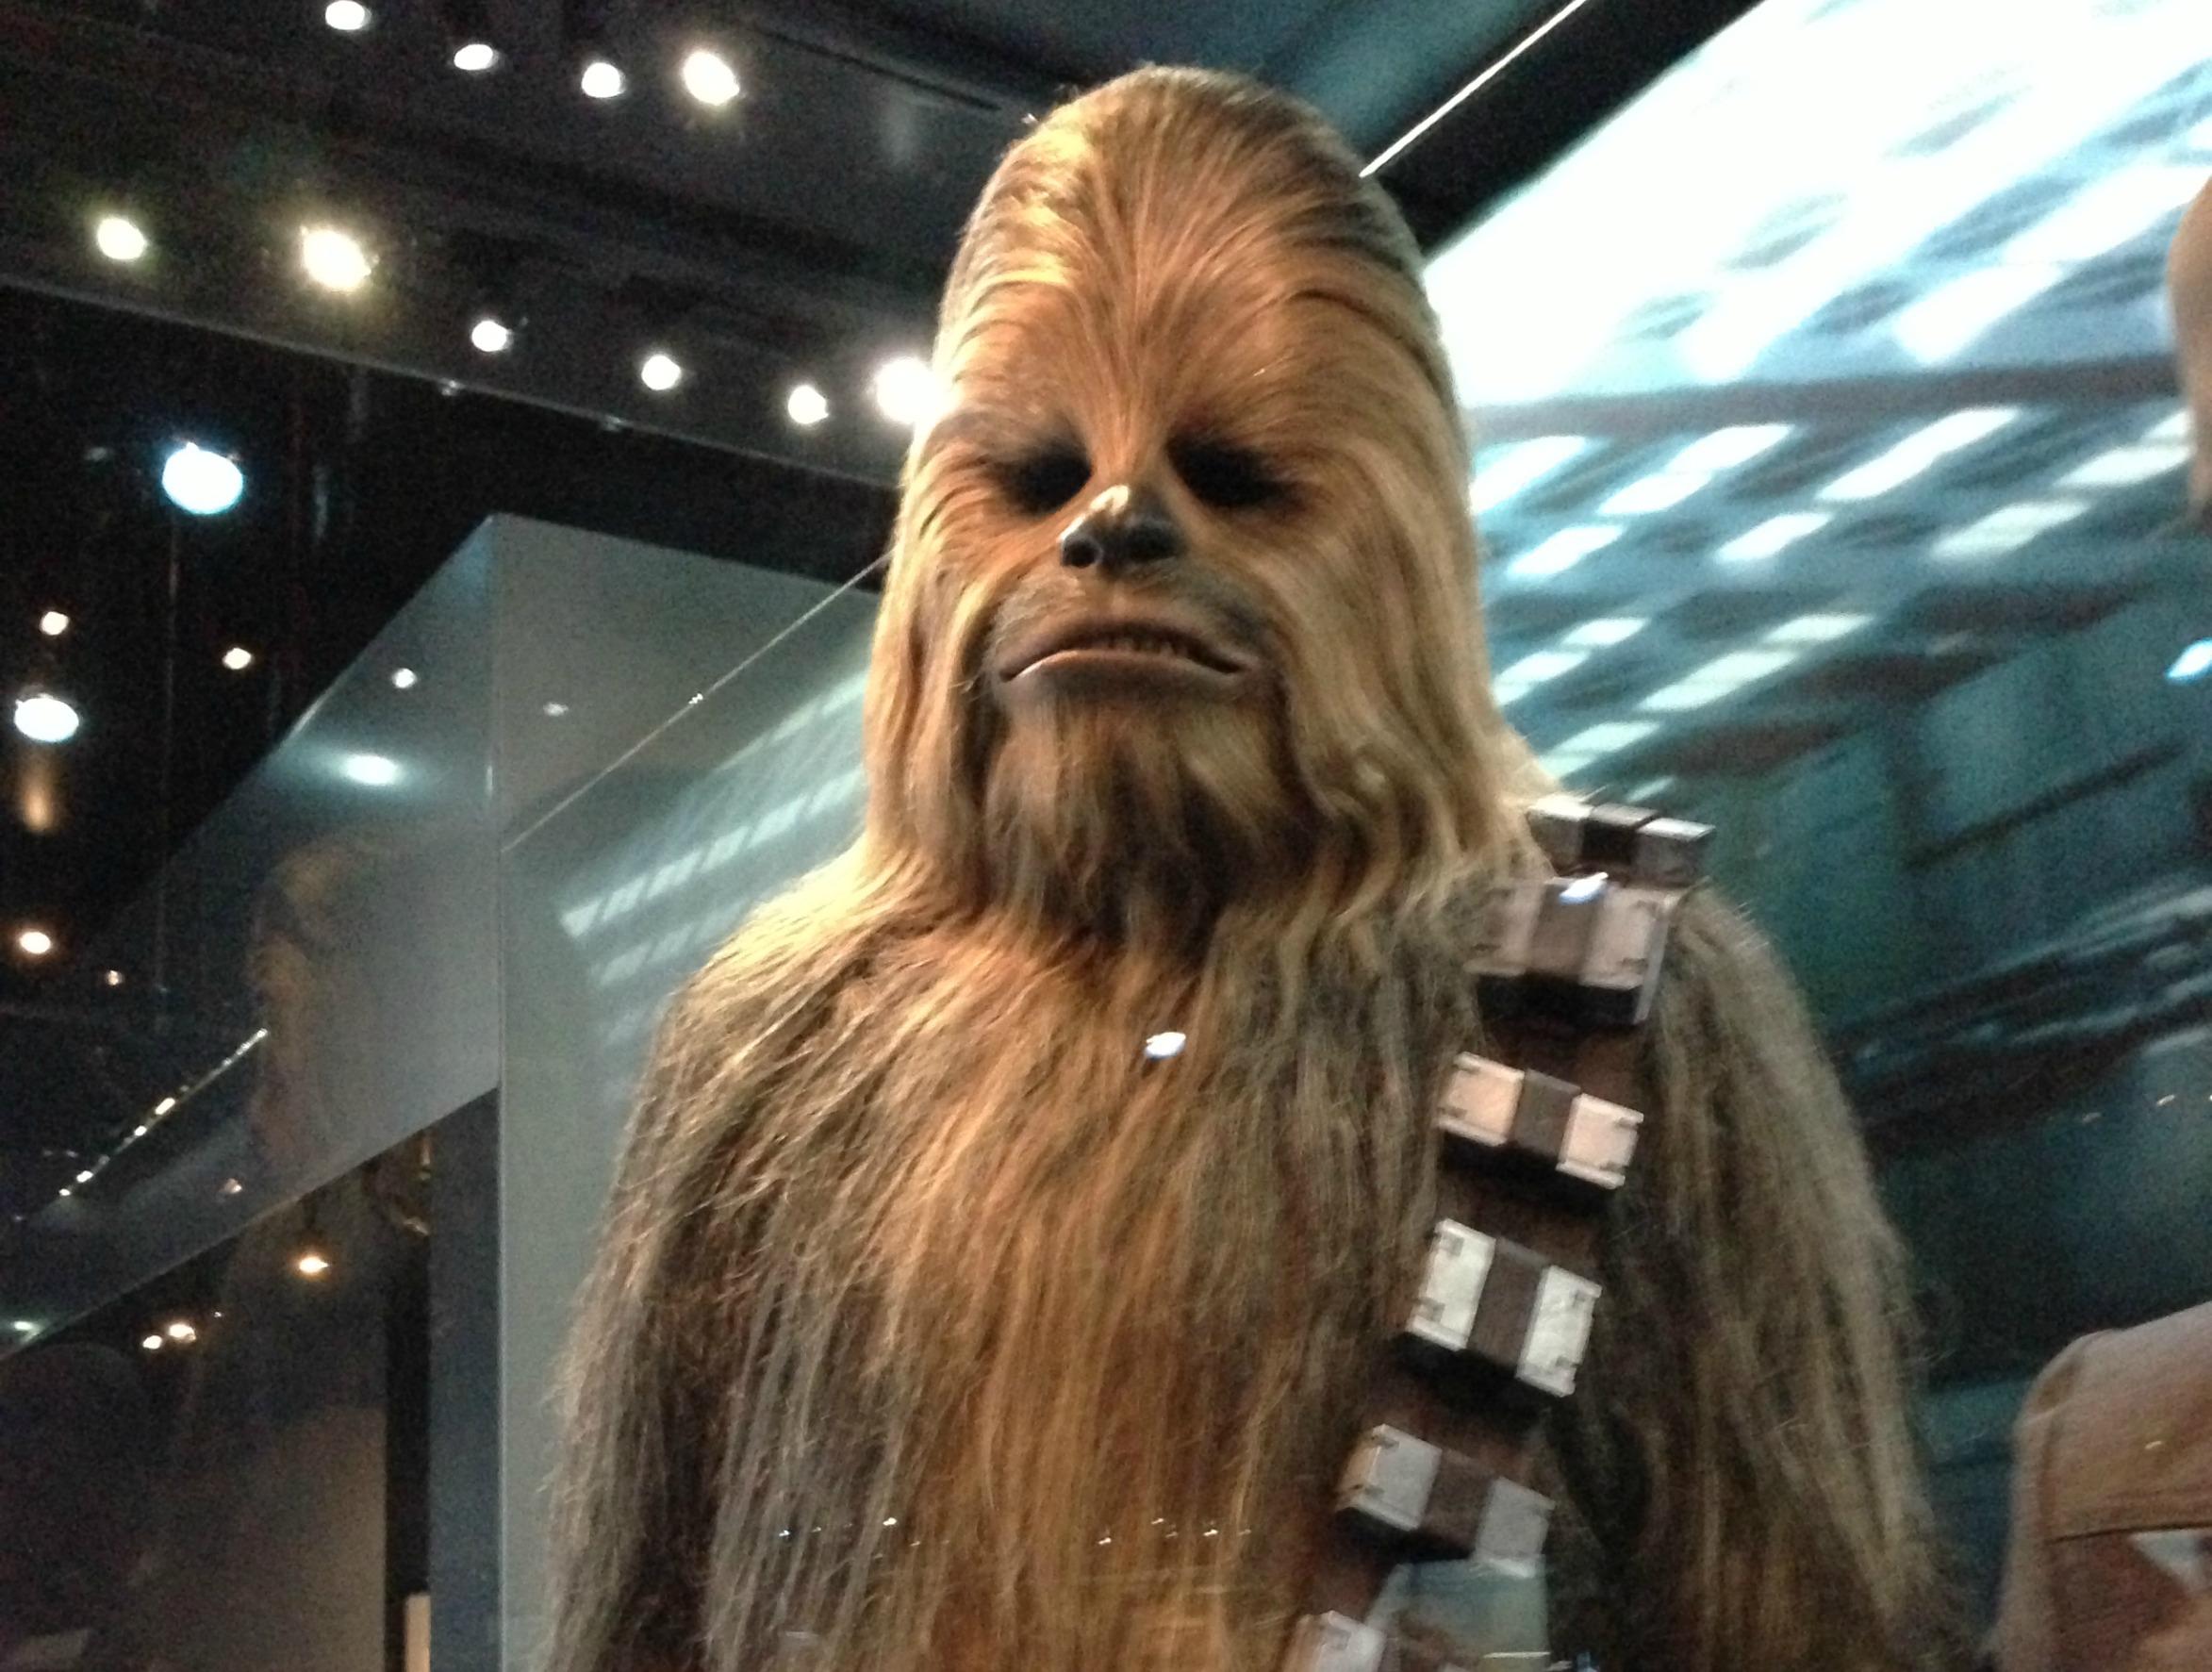 Chewbacca at Star Wars Identities